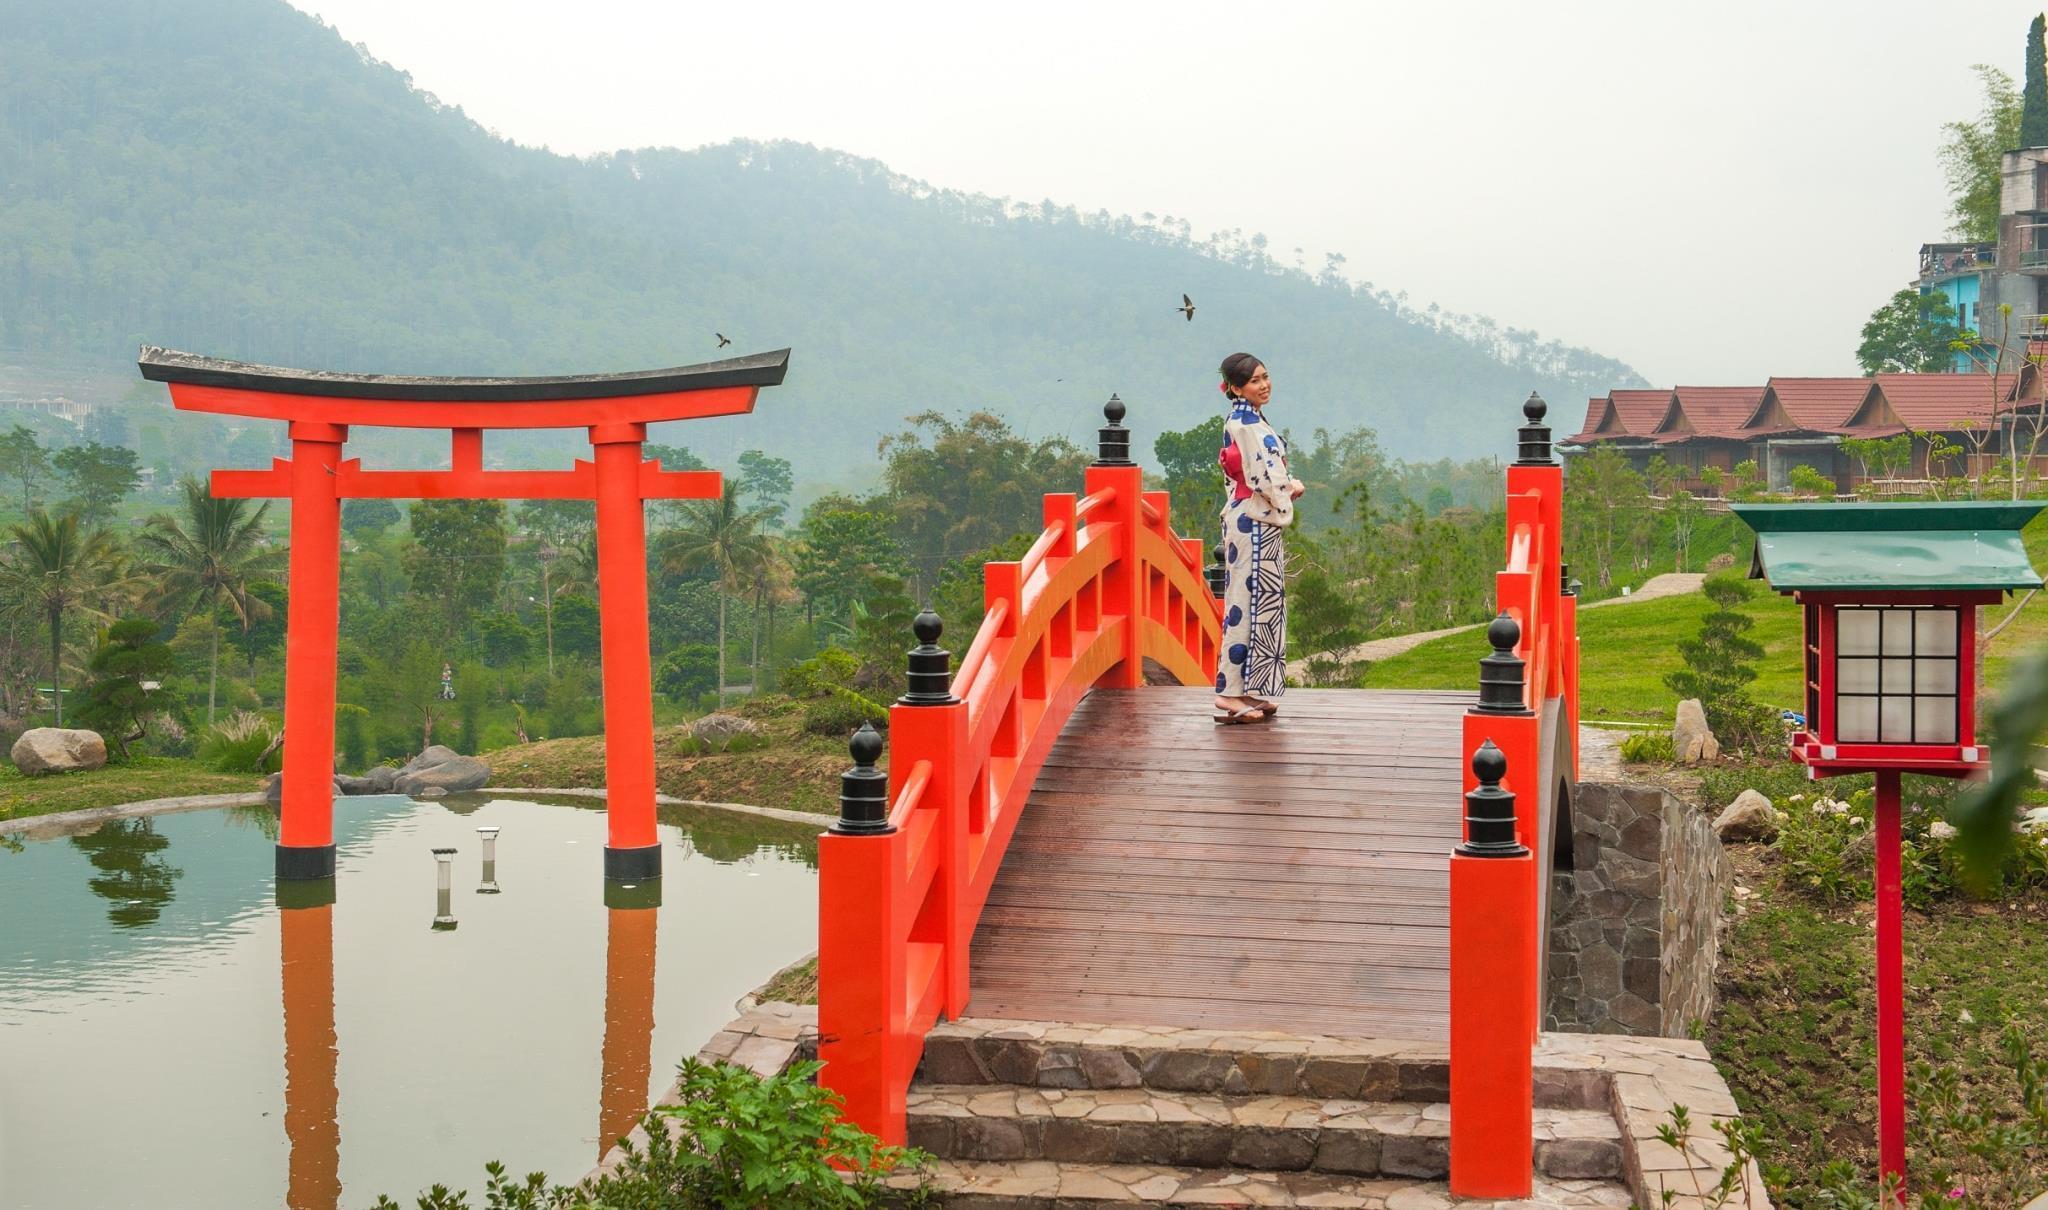 book the onsen hot spring resort in malang indonesia 2018 promos rh agoda com